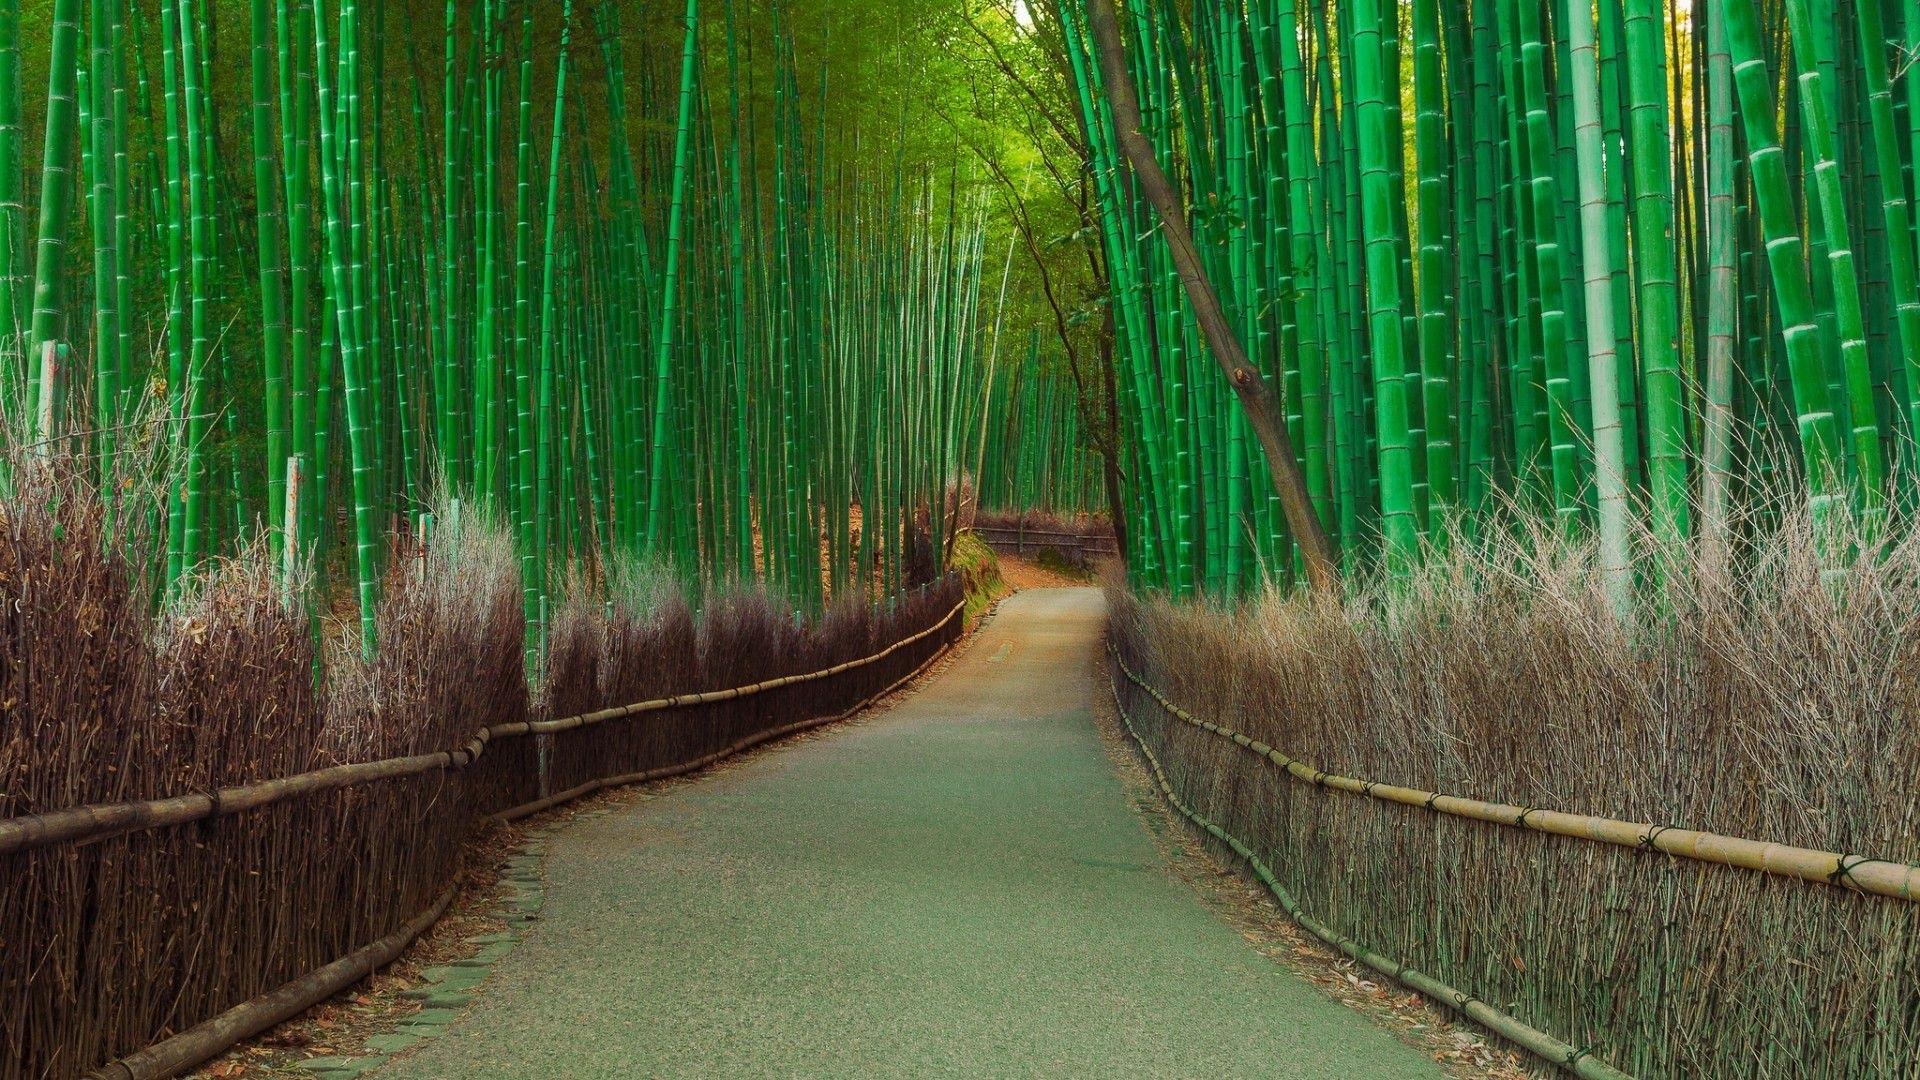 Bamboo Nature Path 1920x1080